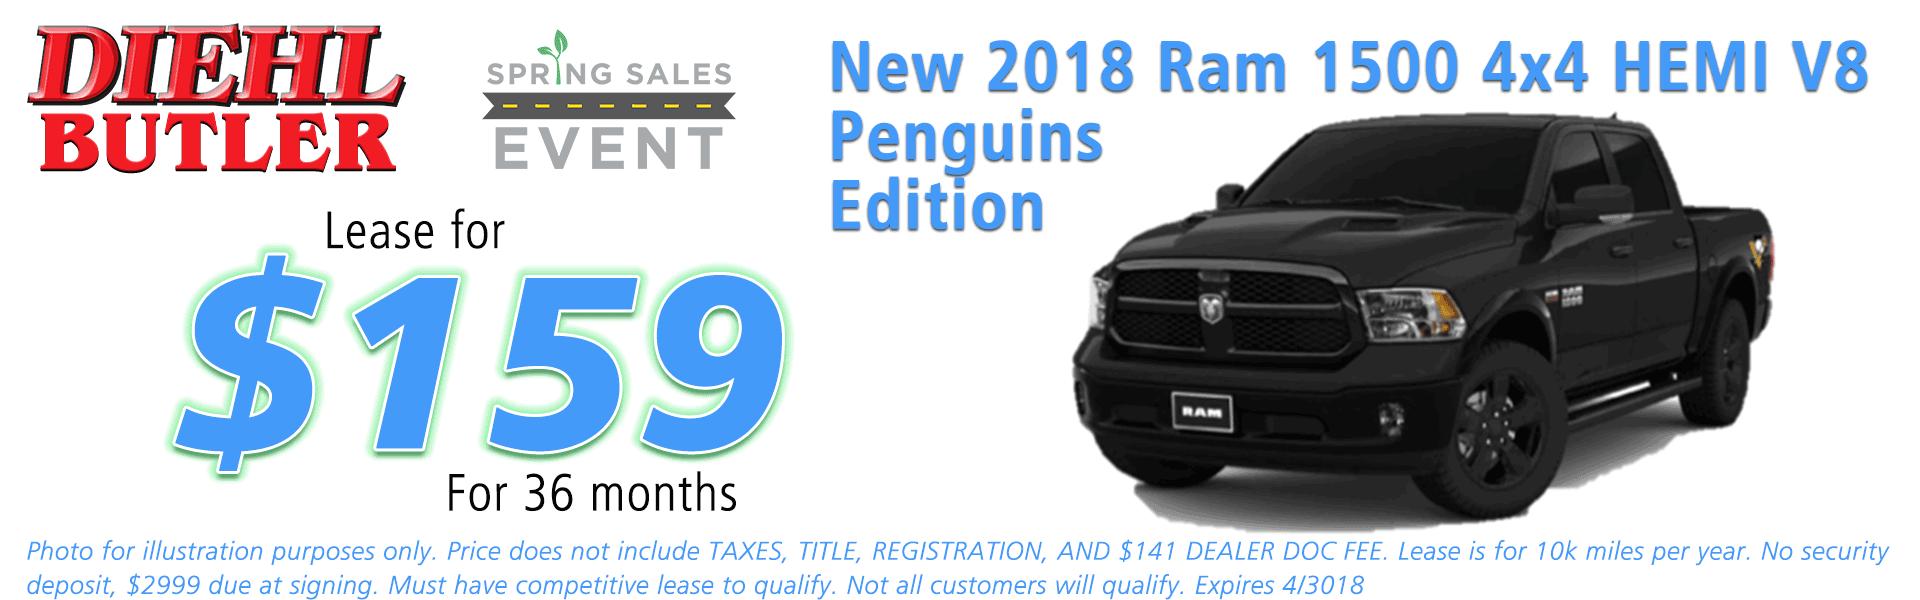 NEW 2018 RAM 1500 EXPRESS CREW CAB 4X4 5'7 BOX official penguins ram truck Diehl of Butler Chrysler Jeep Dodge Ram Toyota Volkswagen 258 Pittsburgh Road Butler PA 16002